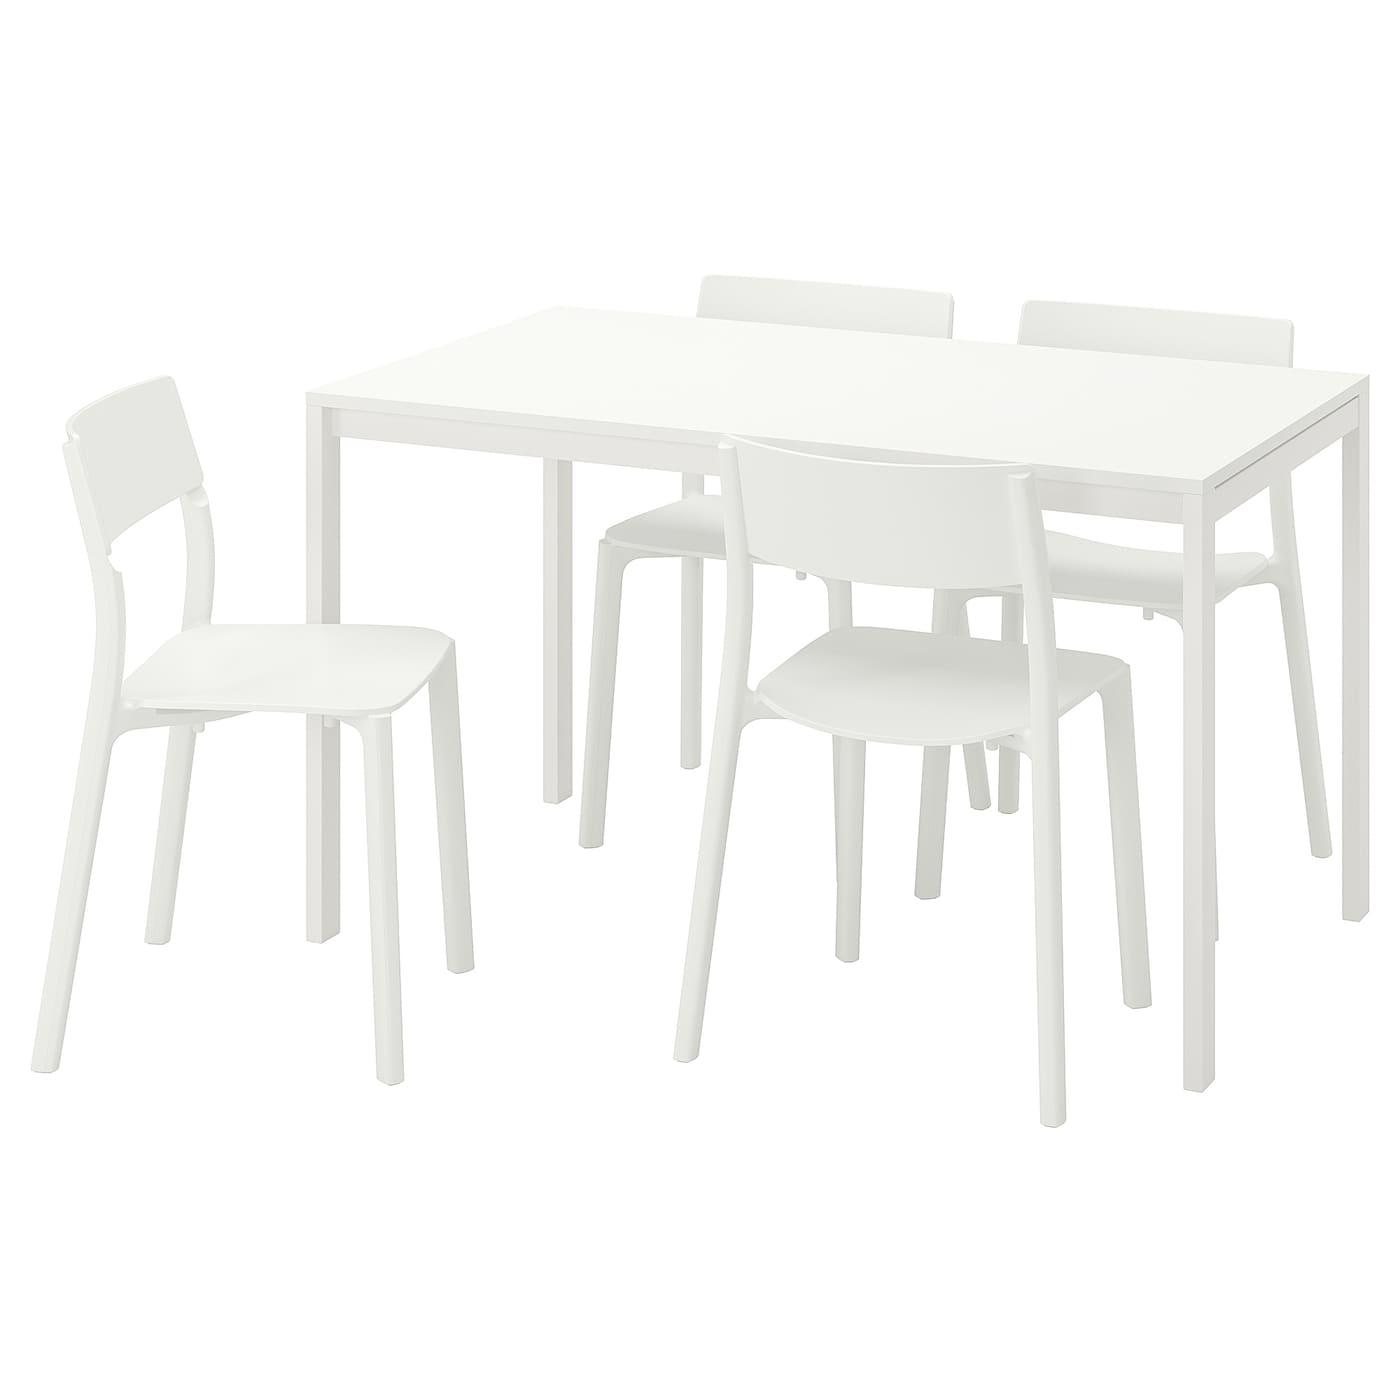 MELLTORP JANINGE Tavolo e 4 sedie bianco, bianco 125 cm